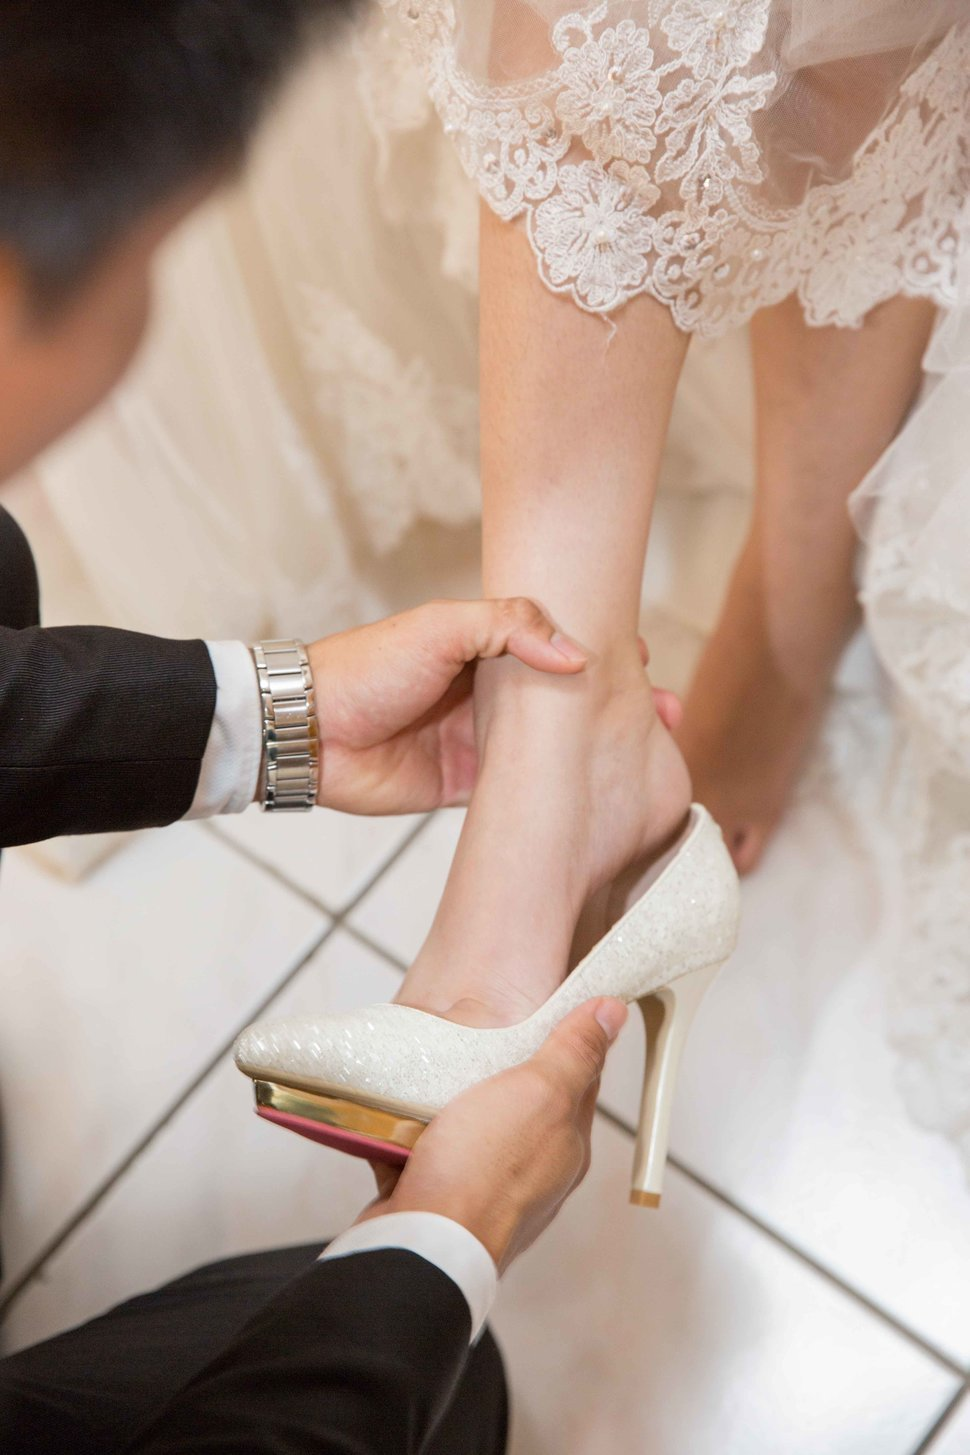 CT 詠翰&穎珊(編號:429581) - CT studio - 結婚吧一站式婚禮服務平台